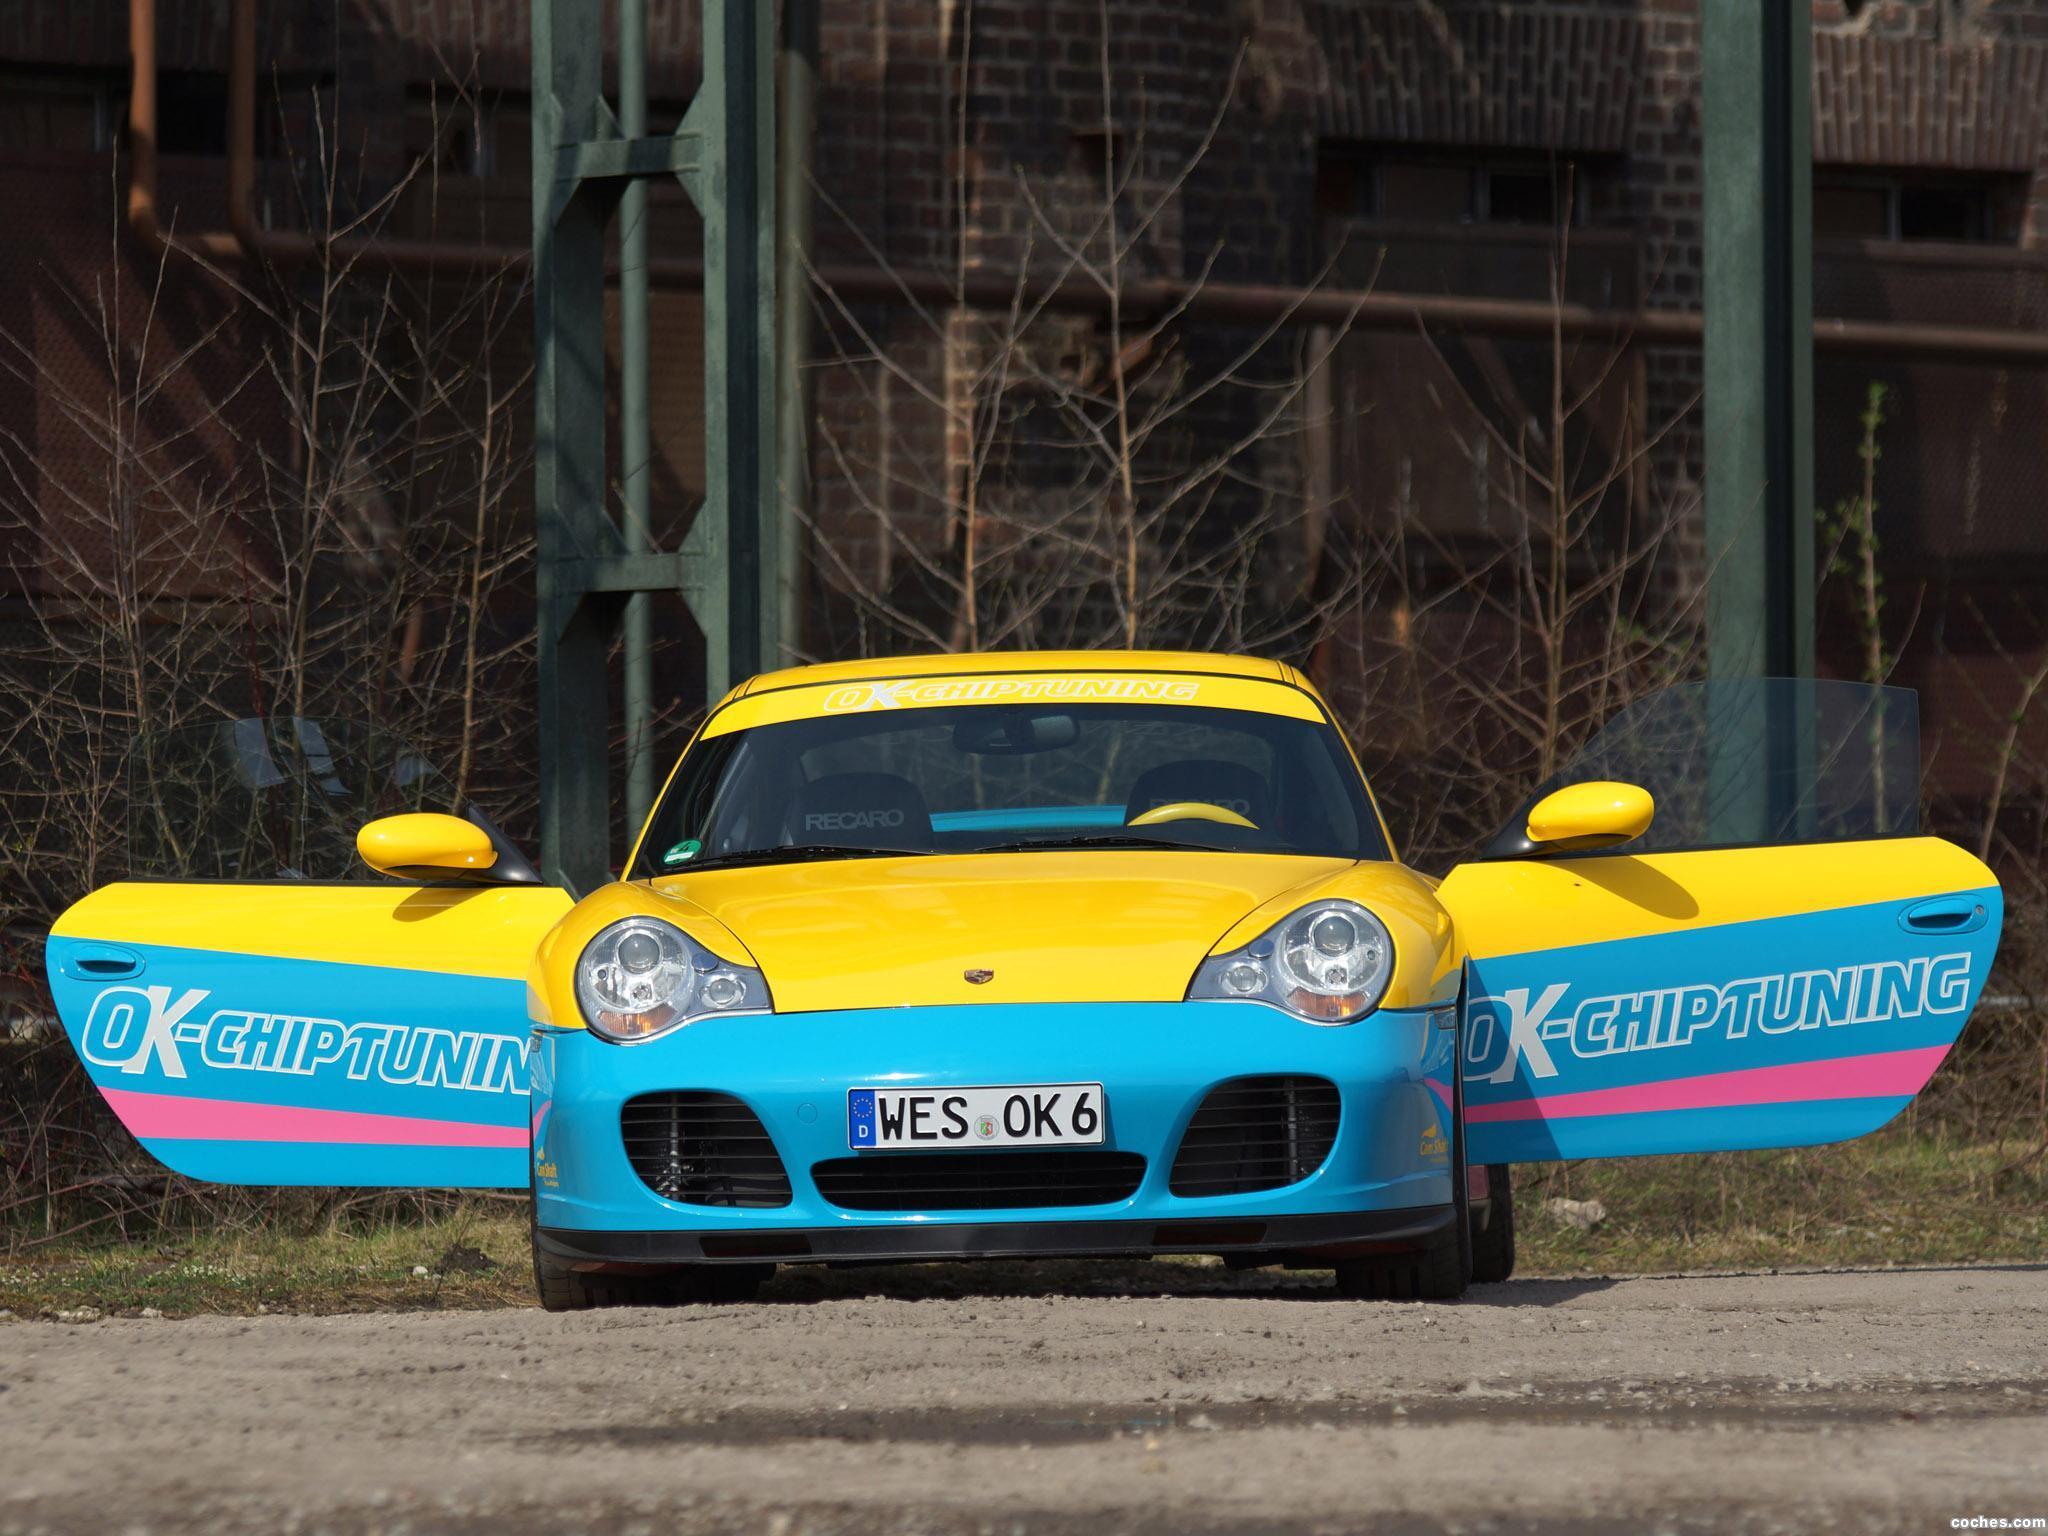 Foto 8 de Cam Shaft Porsche 911 Turbo Ok Chiptuning Manta Tuning 2013